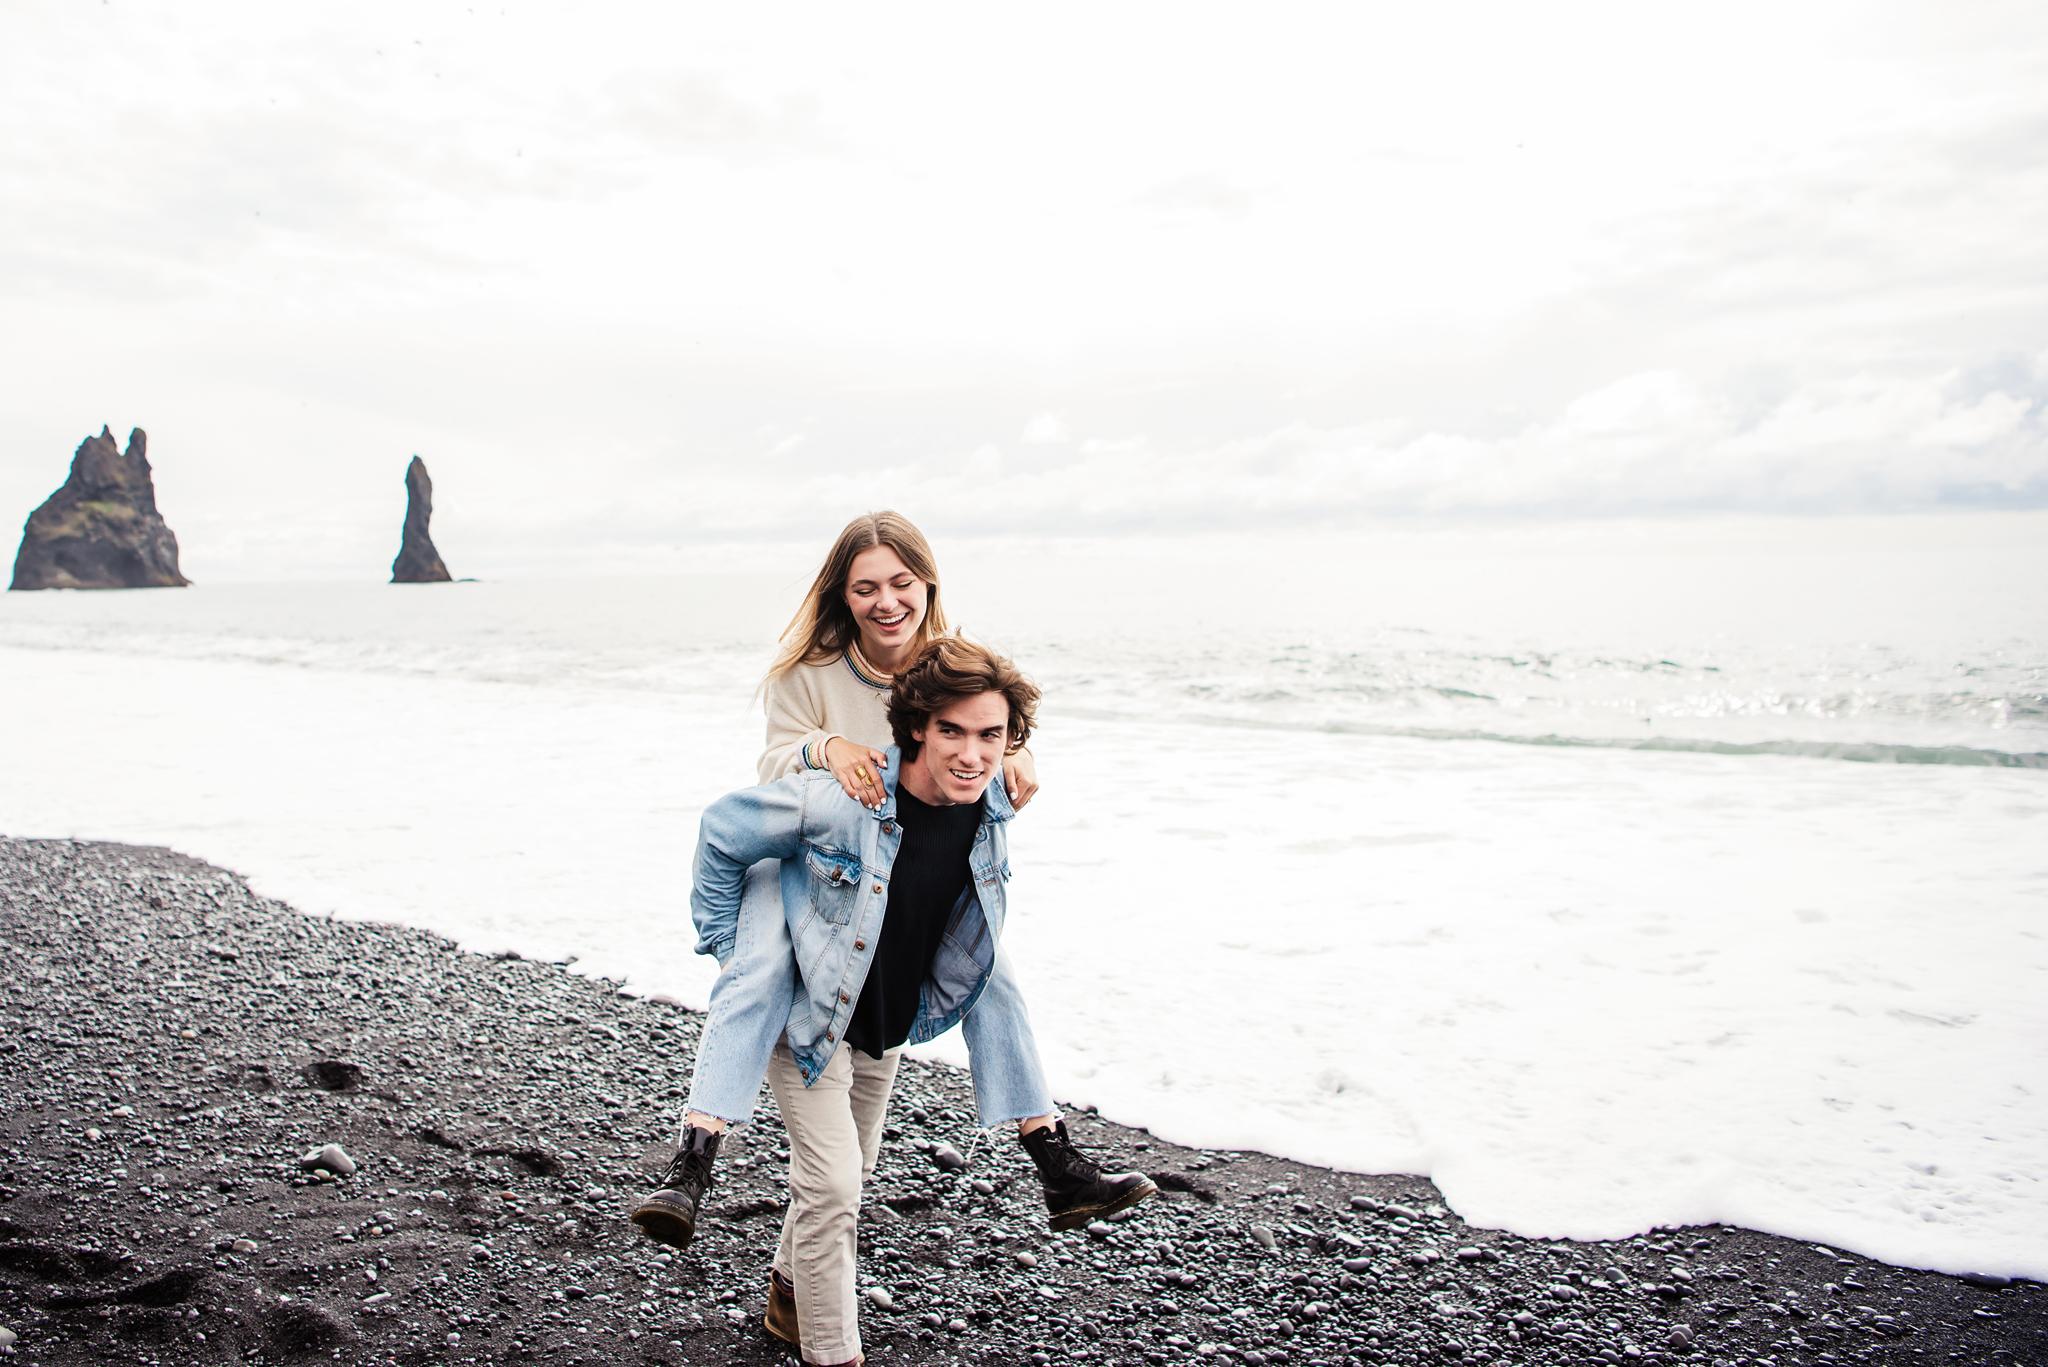 Iceland_Reynisfjara_Black_Sand_Beach_Couples_Session_JILL_STUDIO_Rochester_NY_Photographer_DSC_9744.jpg